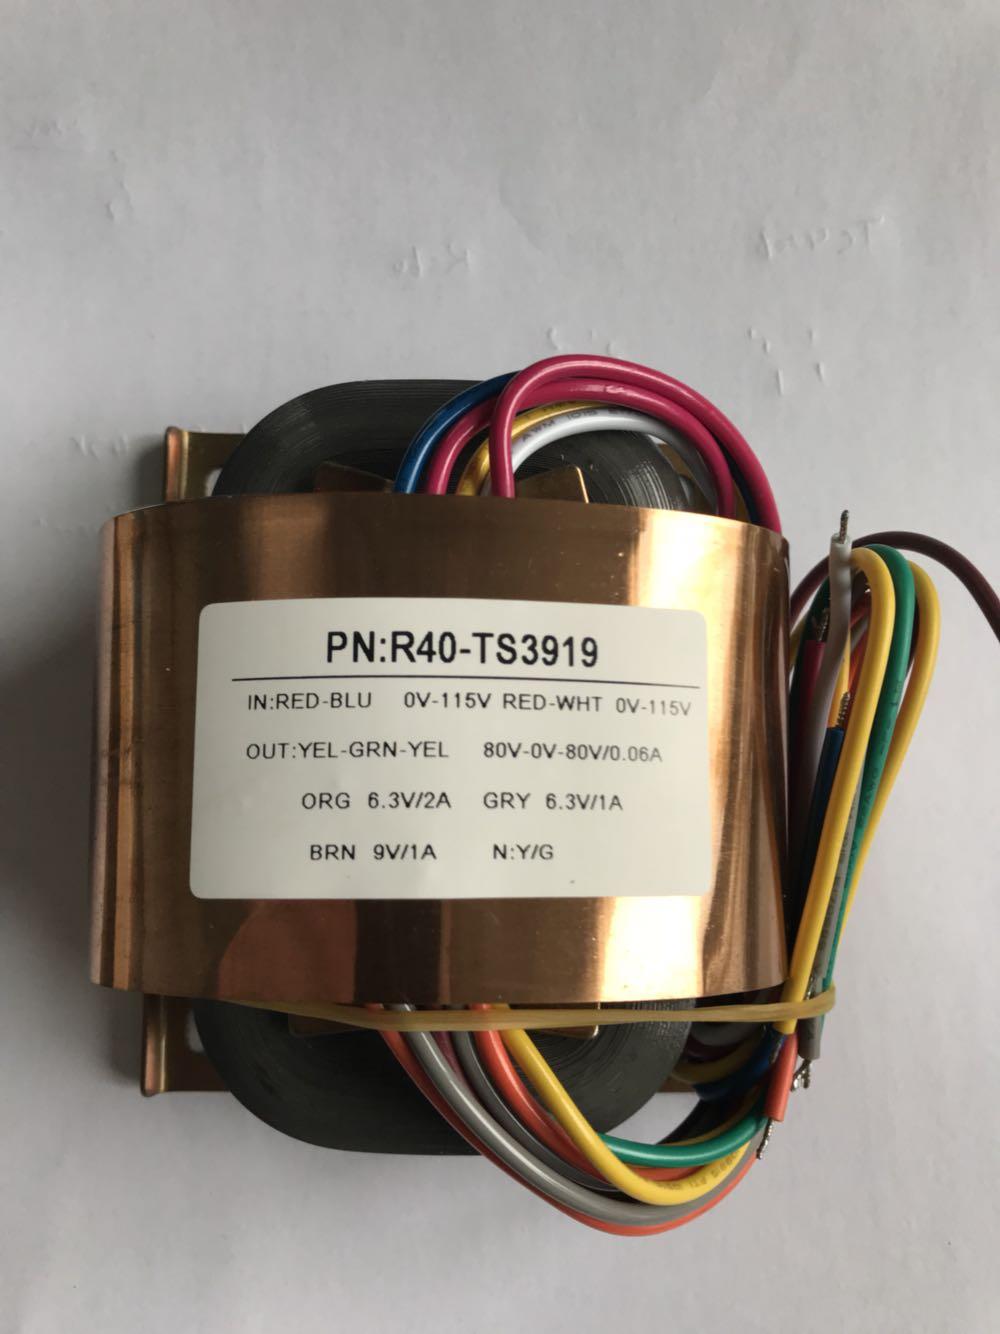 80V-0-80V 60mA 6.3V 2A 6.3V 1A 9V 1A R Core Transformer 50VA R40 custom transformer 115V/115V copper shield Power amplifier 16v 0 16v 1a 2 9v 1a r core transformer 50va r40 custom transformer 110v 110v copper shield output for power supply amplifier